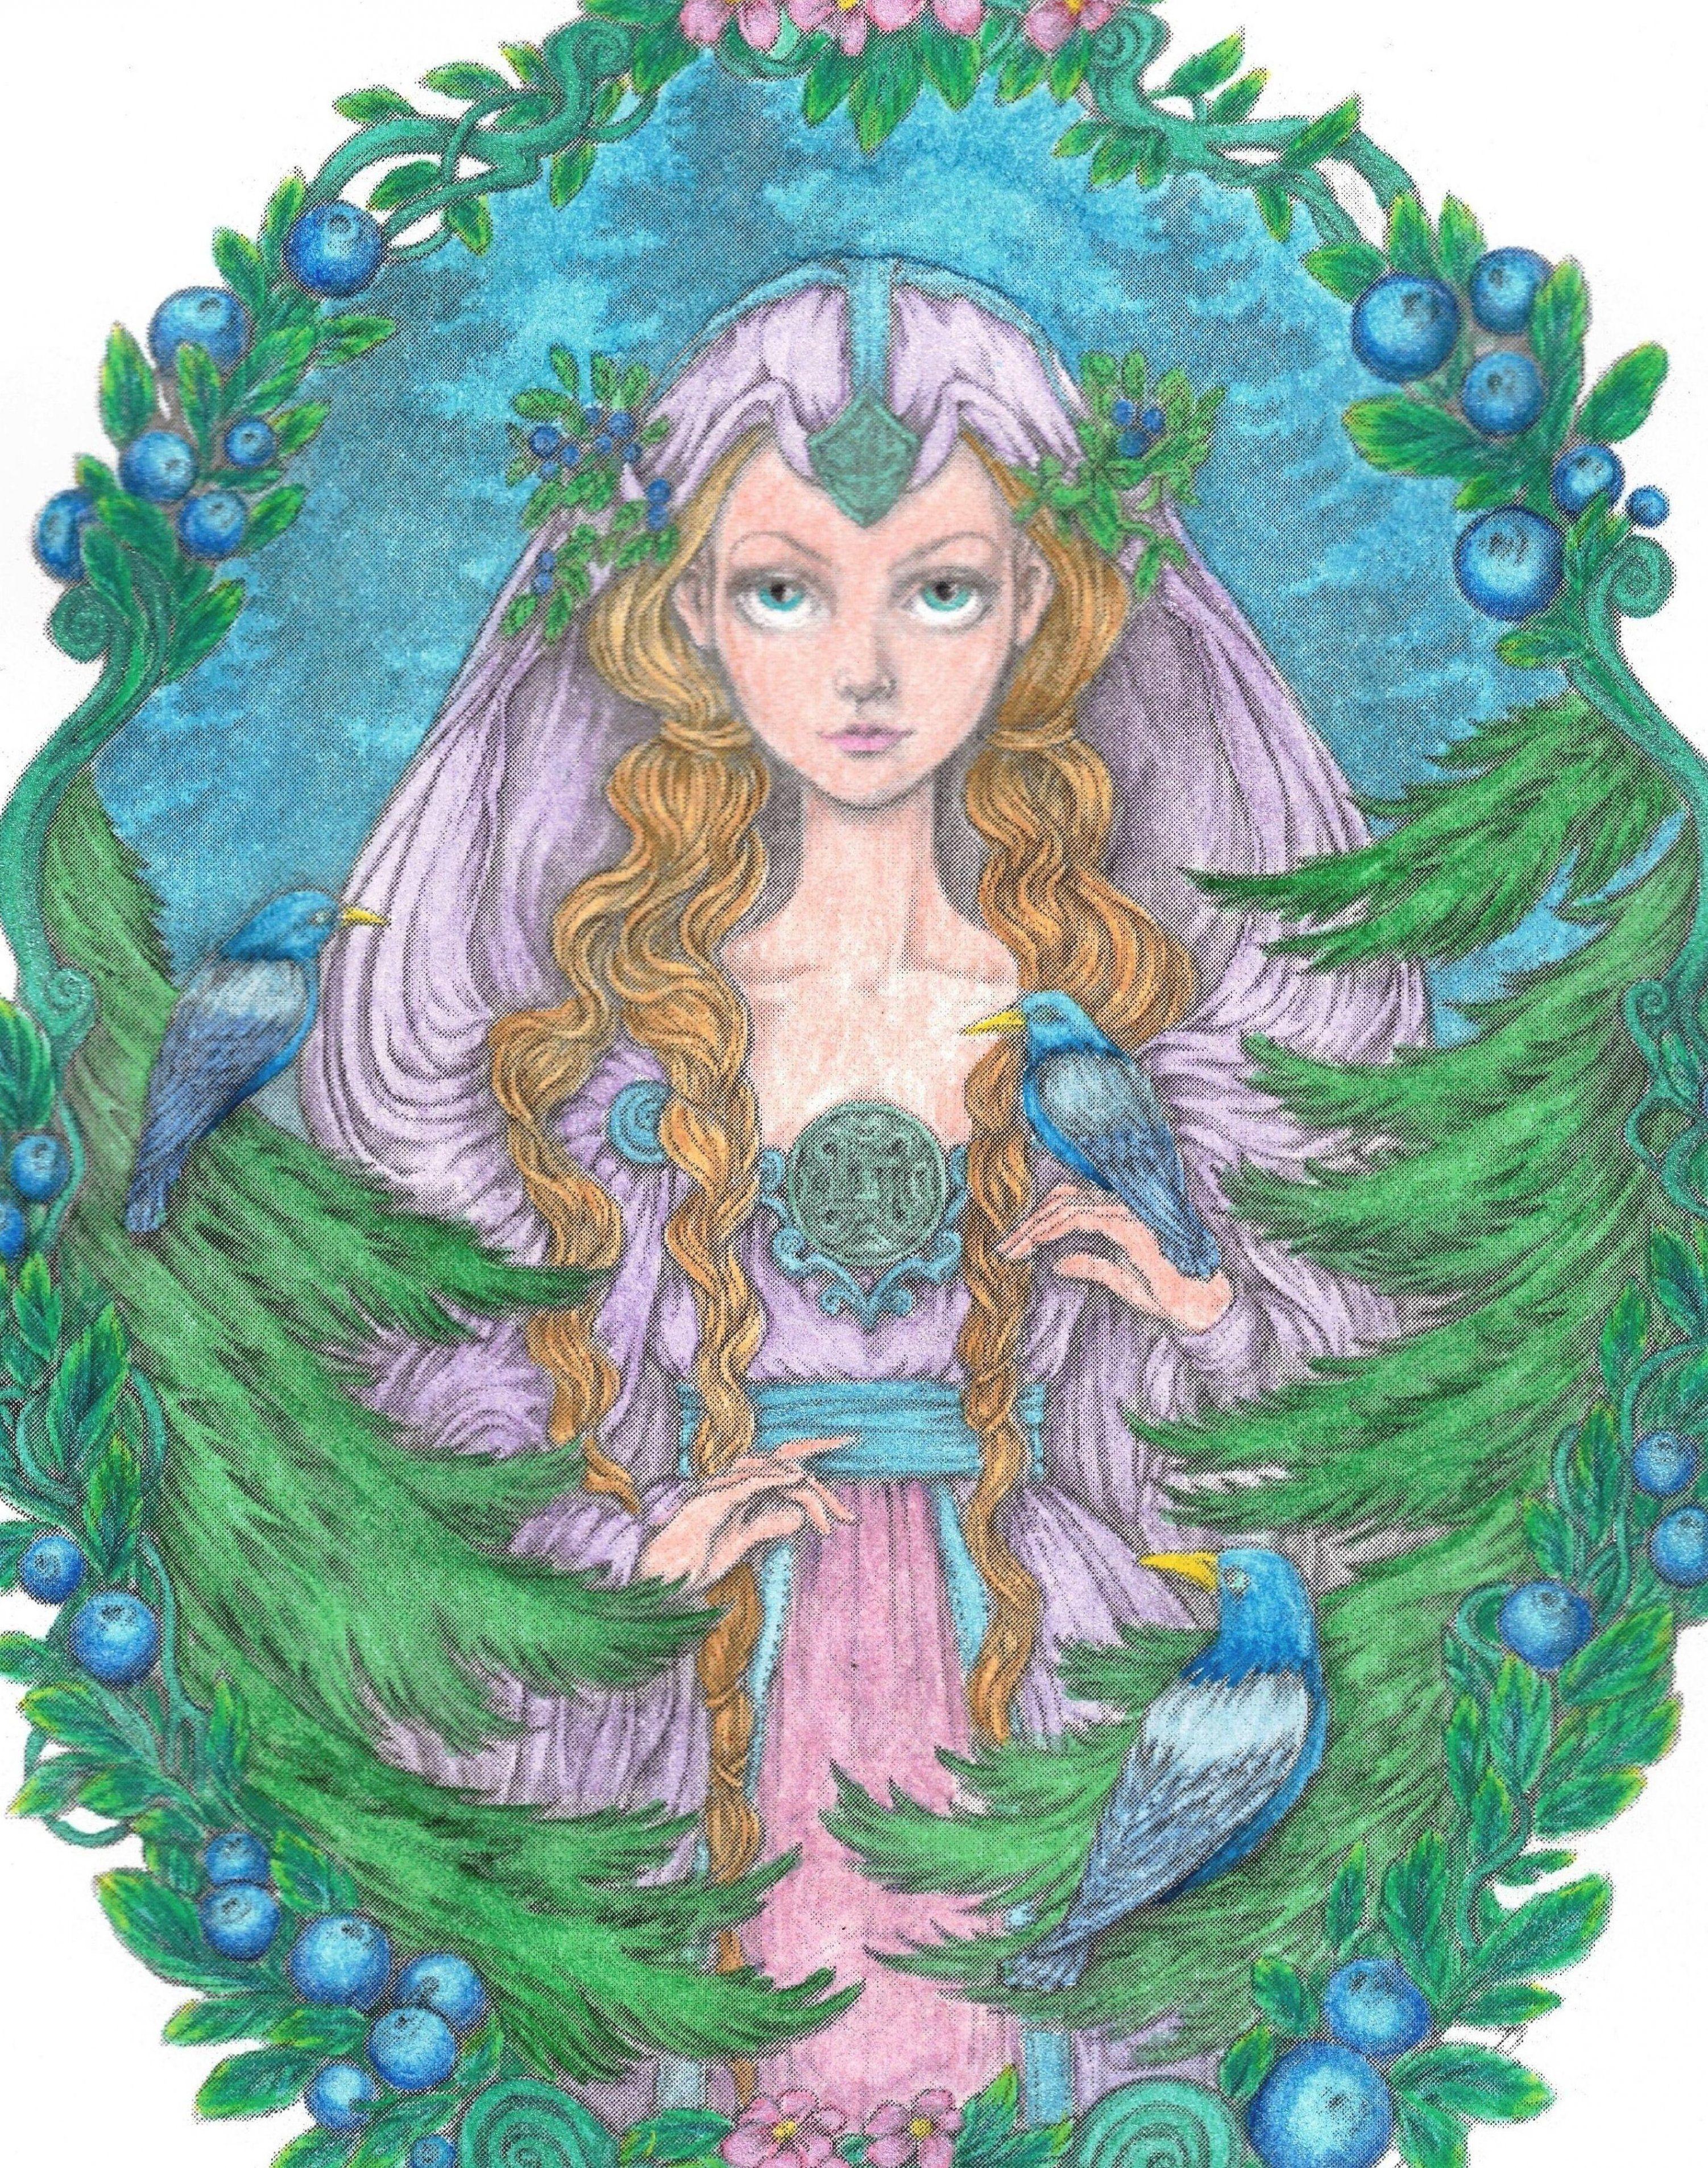 #eevanikunen #patreon #coloringbooks #adultcoloring  #carandache #pablopencils #luminancepencils #painting #fabercastell #gelatos #mixedmedia #art #watercolors #mgrahamwatercolors #painting #shinhan #danielsmithwatercolors